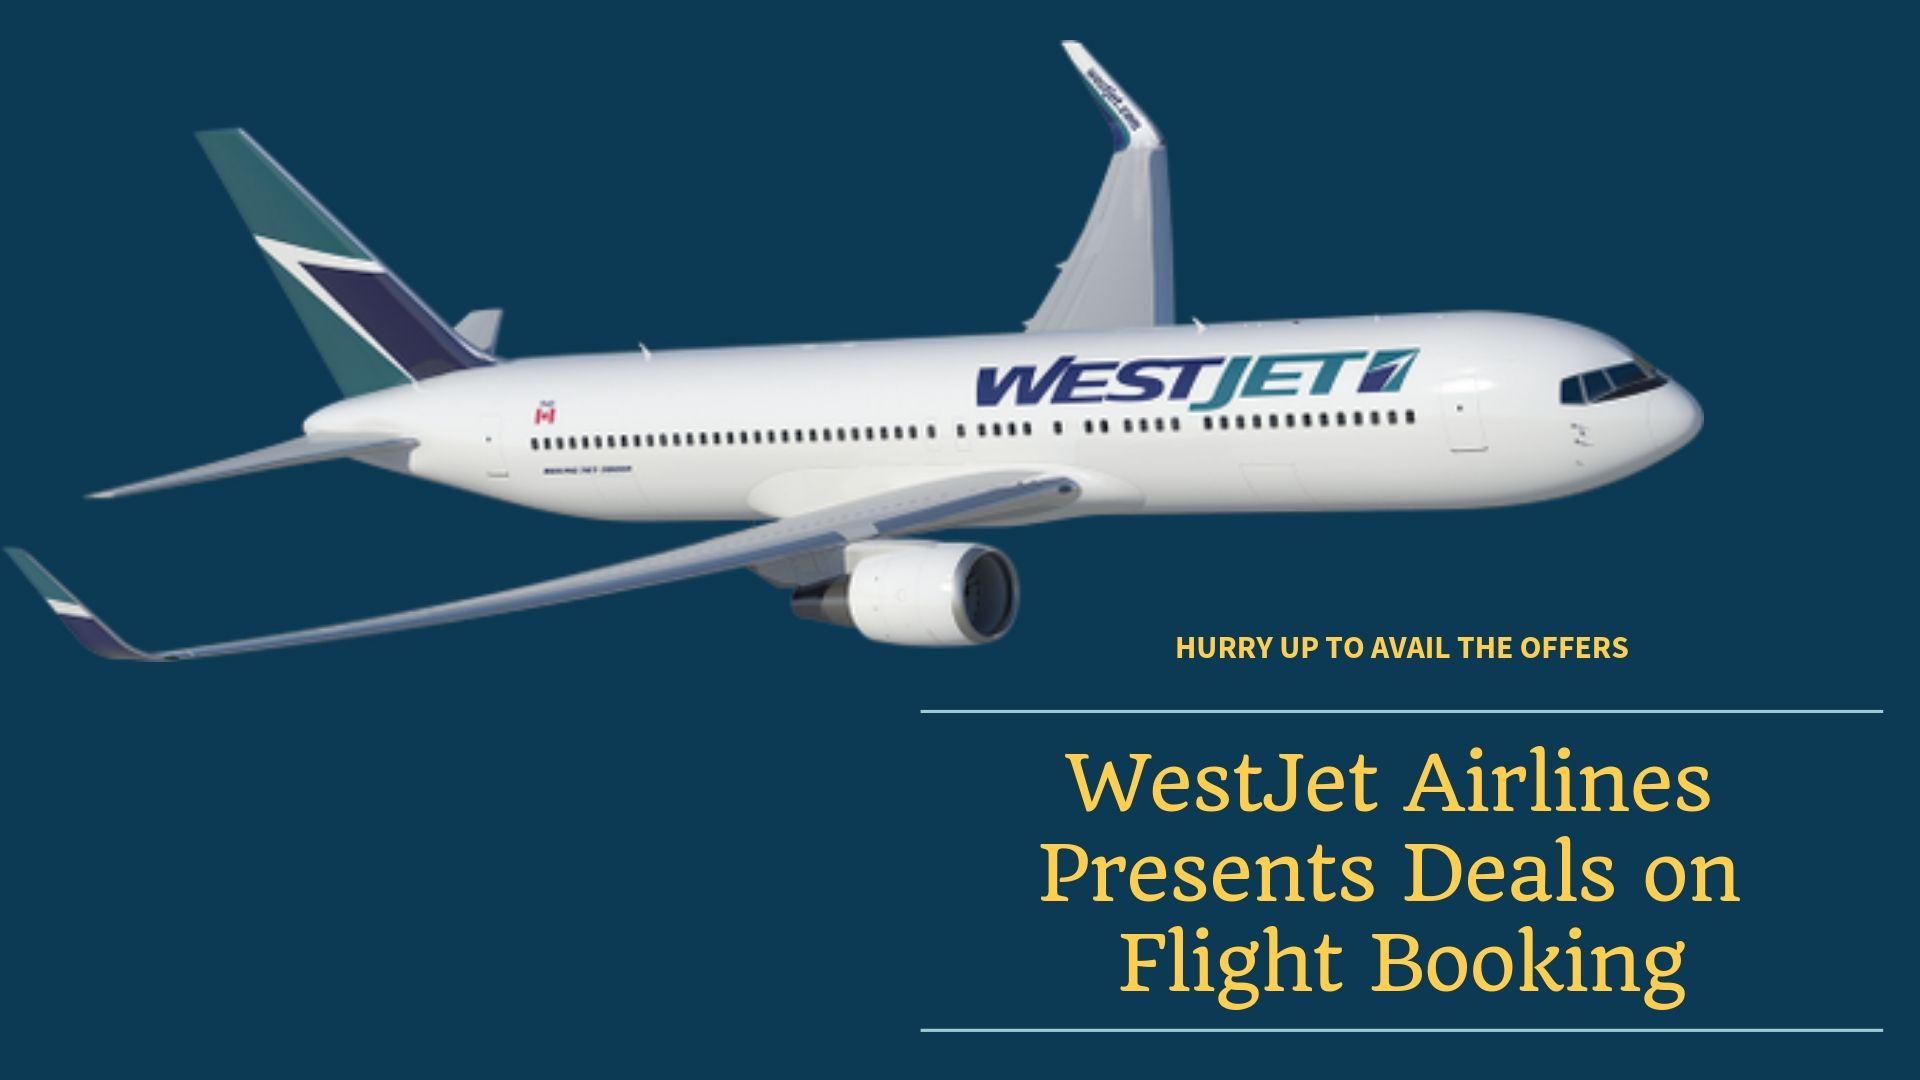 Westjet Airlines Flight Book Your Seats On Westjet Airlines